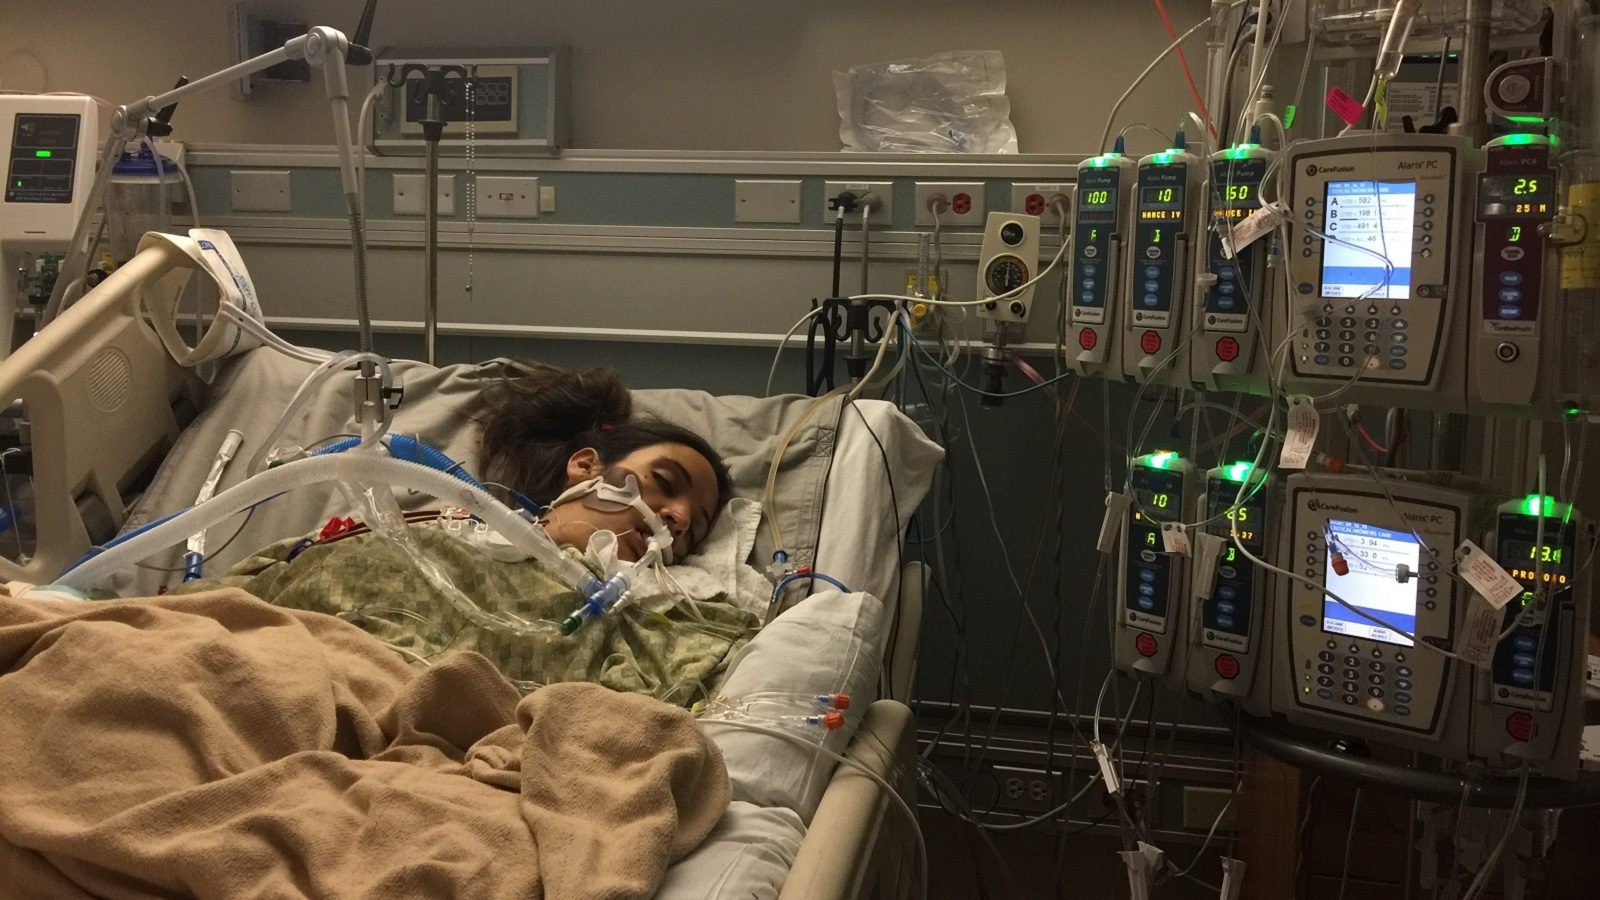 maternal - Leah Bahrencu hospitalized